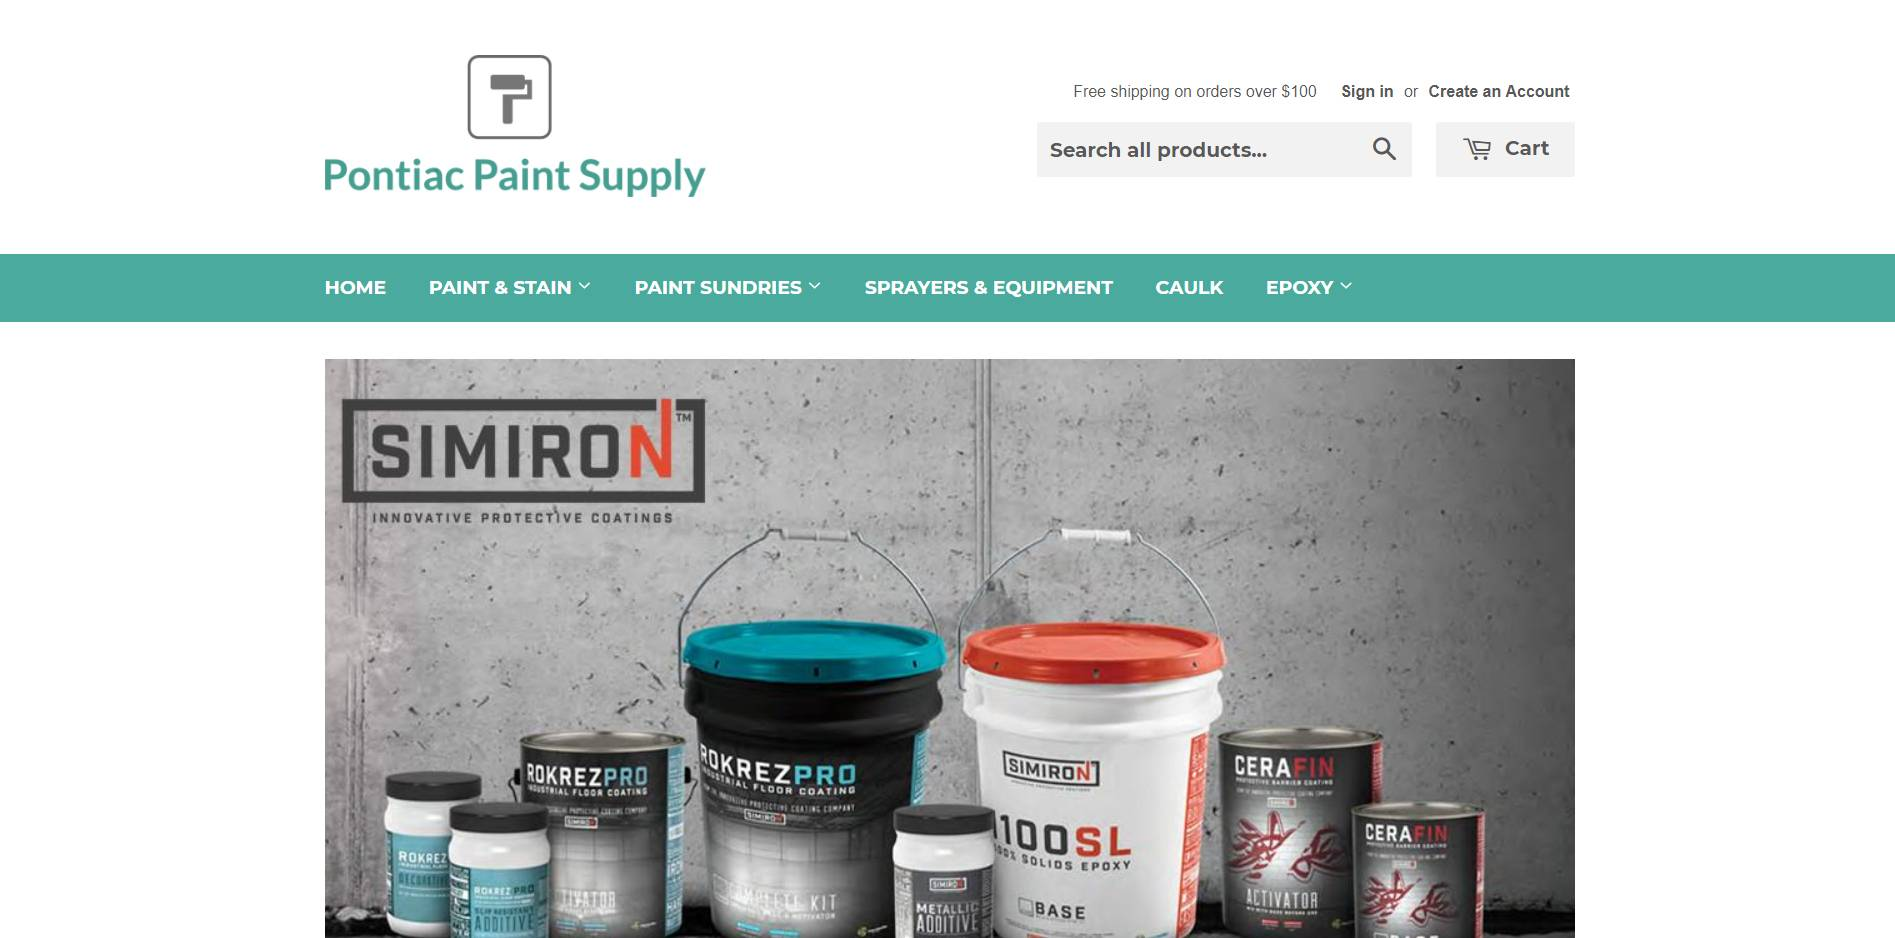 Pontiac Paint Supply